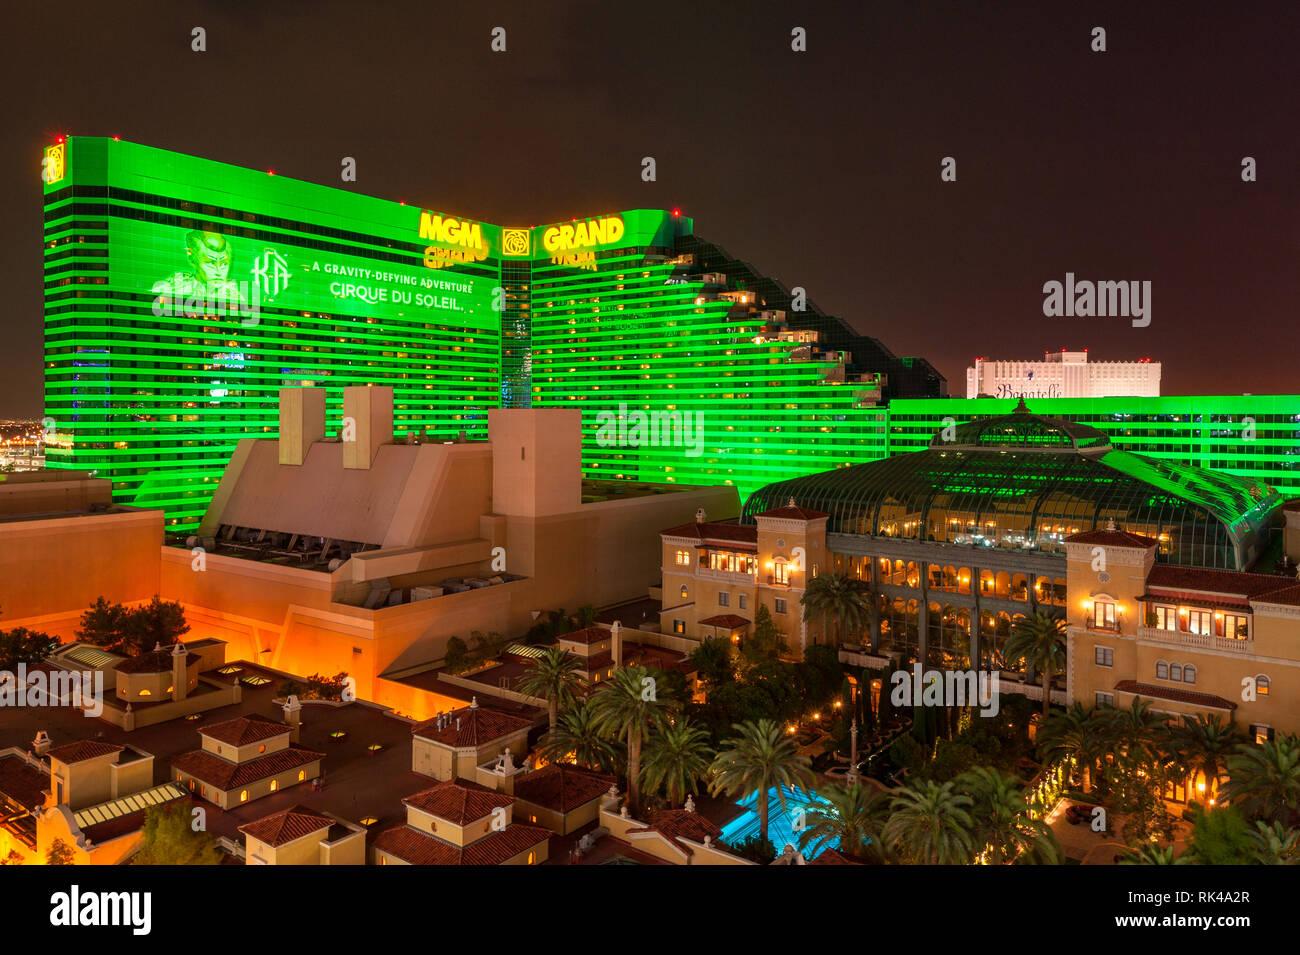 Hohe Betrachtungswinkel Auf Dem Mgm Grand Hotel Und Casino Auf Dem Strip Boulevard Las Vegas Nevada Usa Bei Nacht Stockfotografie Alamy